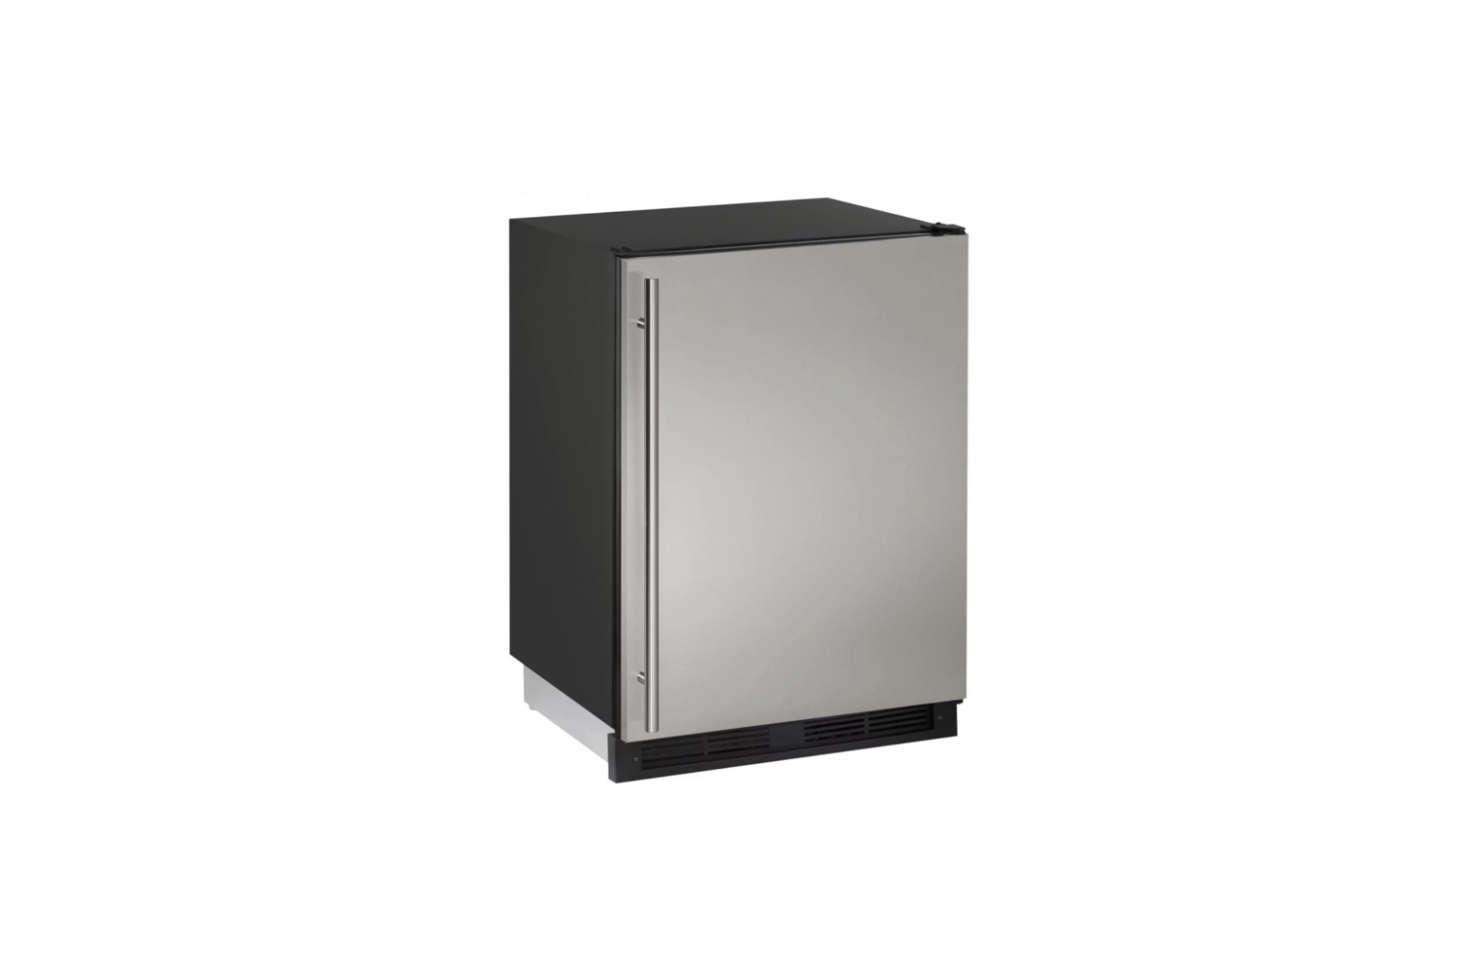 Indoor For A Basic Industrial Mini Combo Series Easy Compact Refrigerators Remodelista Avanti Mini Fridge Reviews Avanti Mini Fridge Home Depot houzz-03 Avanti Mini Fridge